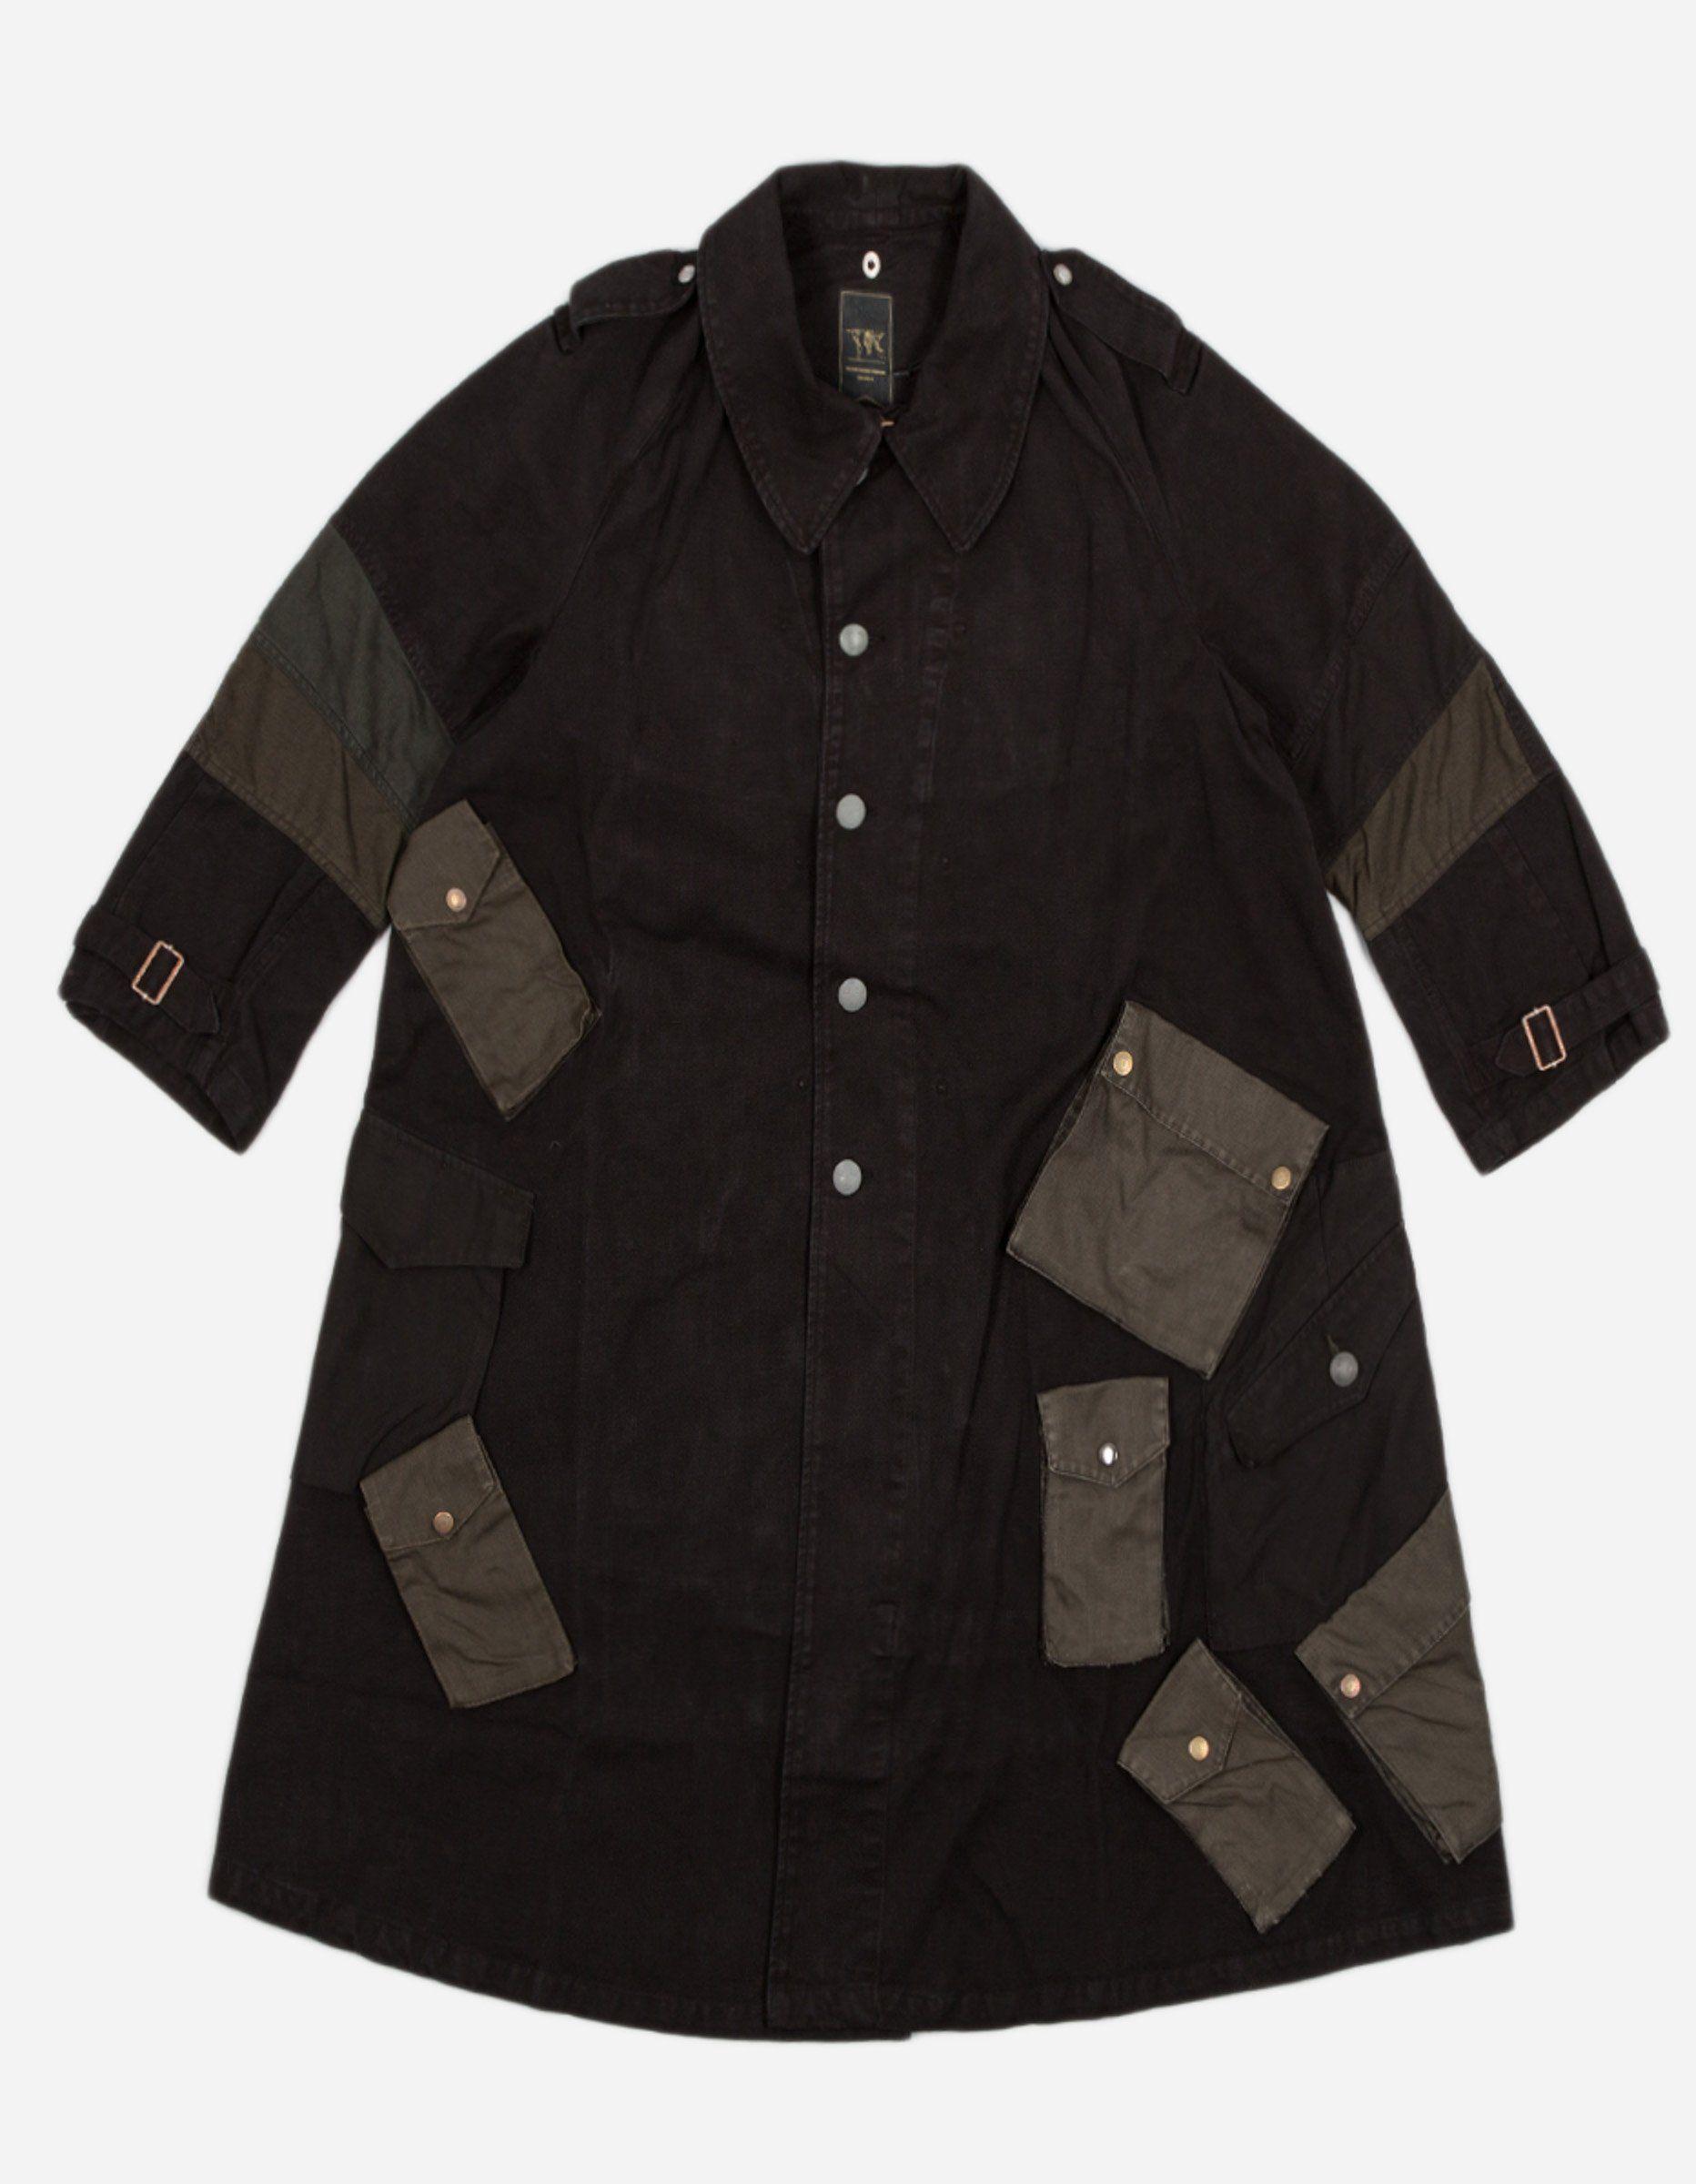 Pin by Ben Knobel on Goods Coat, Vintage military, Mens tops